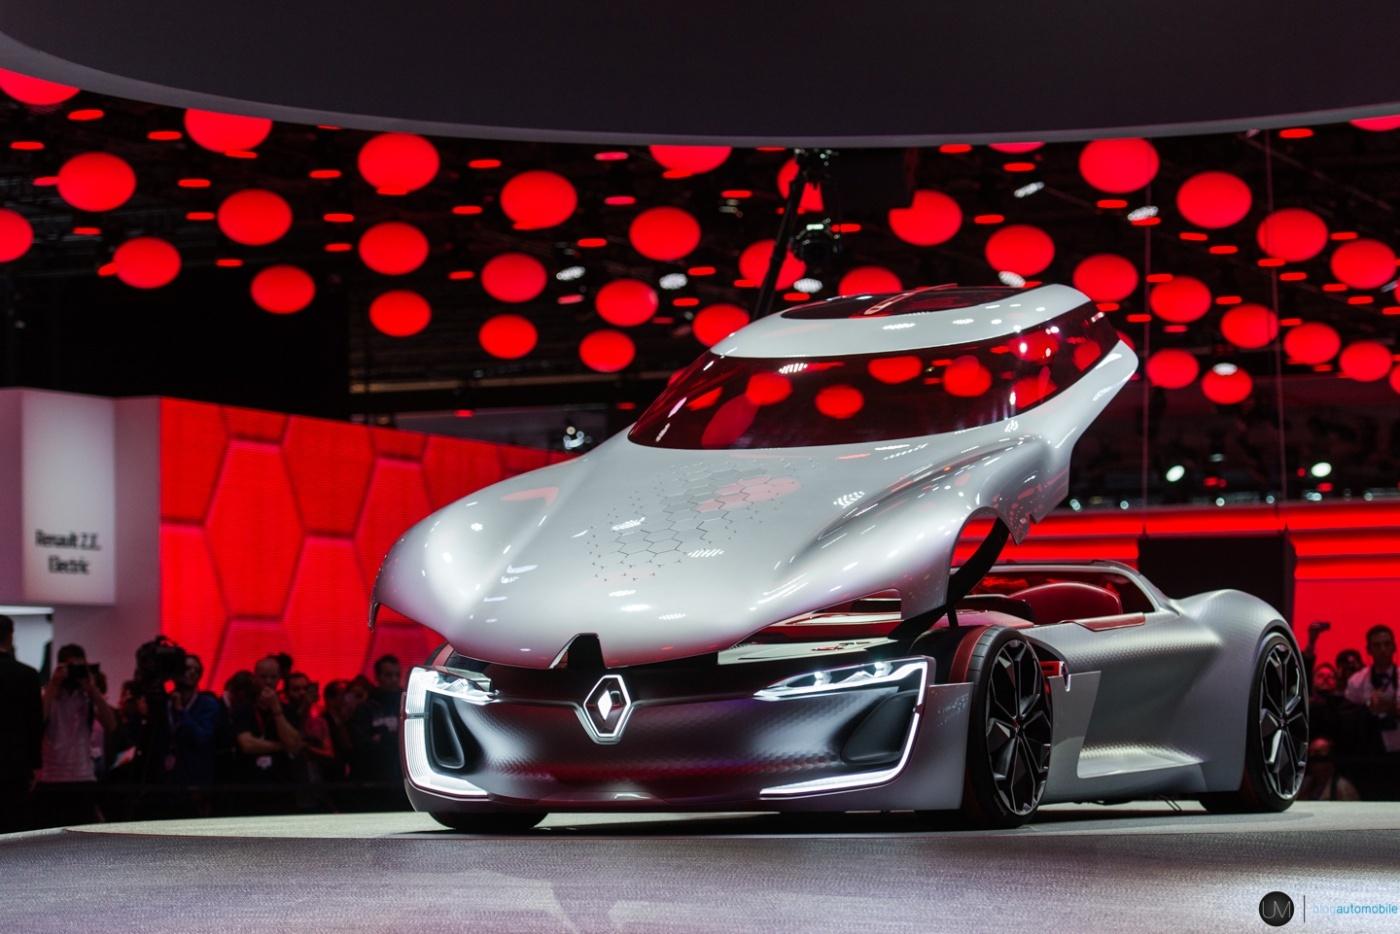 festival automobile international 2017 l 39 alfa romeo giulia plus belle voiture de l 39 ann e. Black Bedroom Furniture Sets. Home Design Ideas